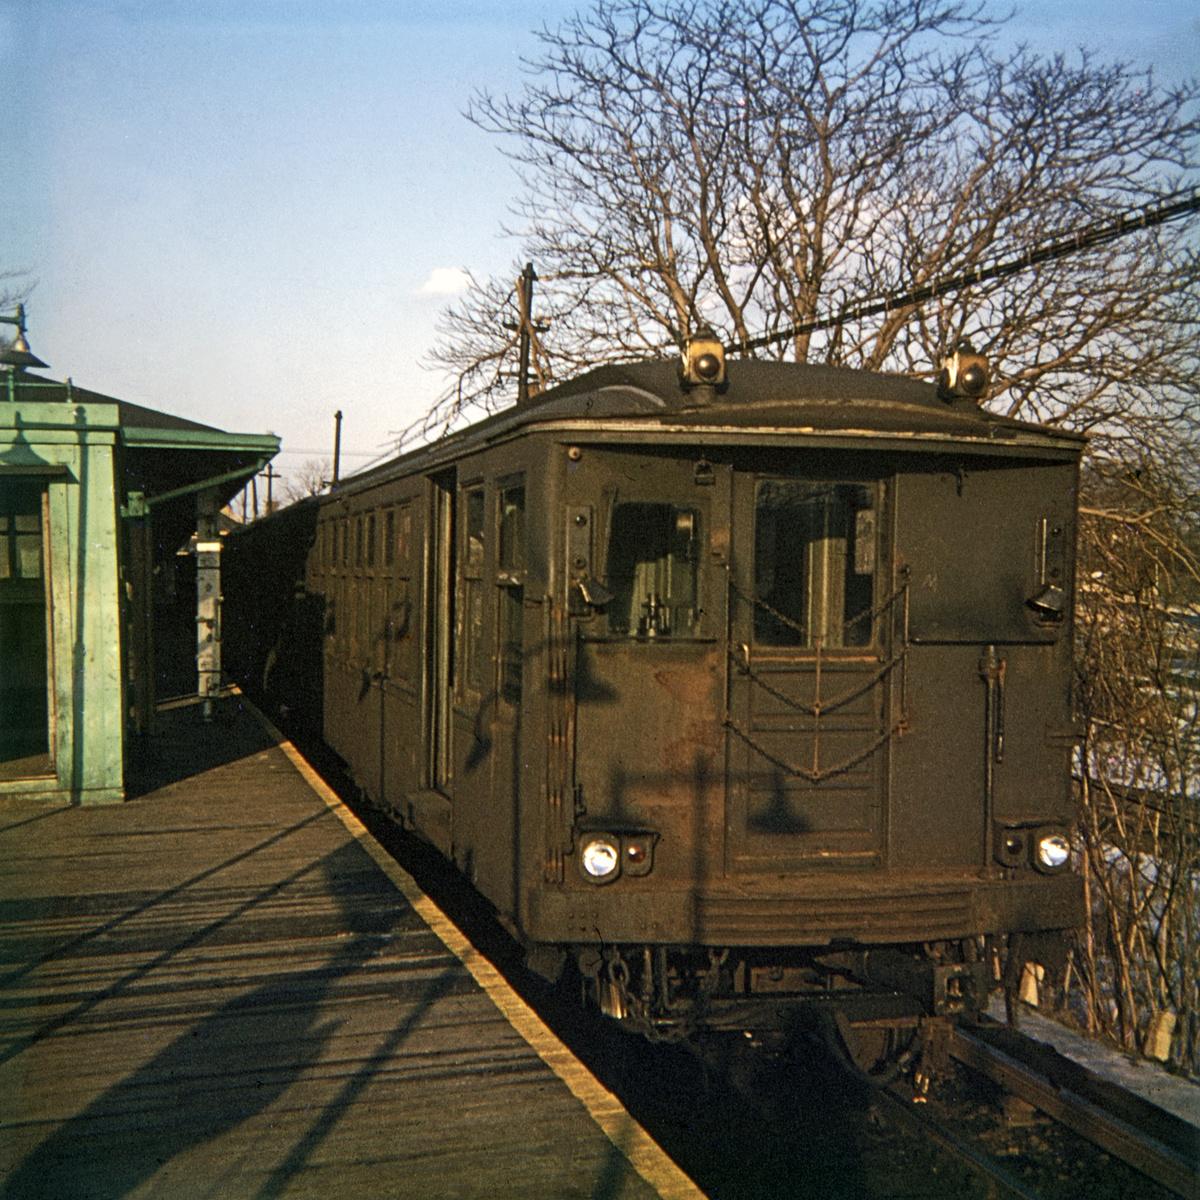 (432k, 1024x682)<br><b>Country:</b> United States<br><b>City:</b> New York<br><b>System:</b> New York City Transit<br><b>Line:</b> BMT Myrtle Avenue Line<br><b>Location:</b> Metropolitan Avenue <br><b>Car:</b> BMT Q  <br><b>Photo by:</b> Steve Hoskins<br><b>Collection of:</b> David Pirmann<br><b>Date:</b> 1/1967<br><b>Viewed (this week/total):</b> 2 / 3240